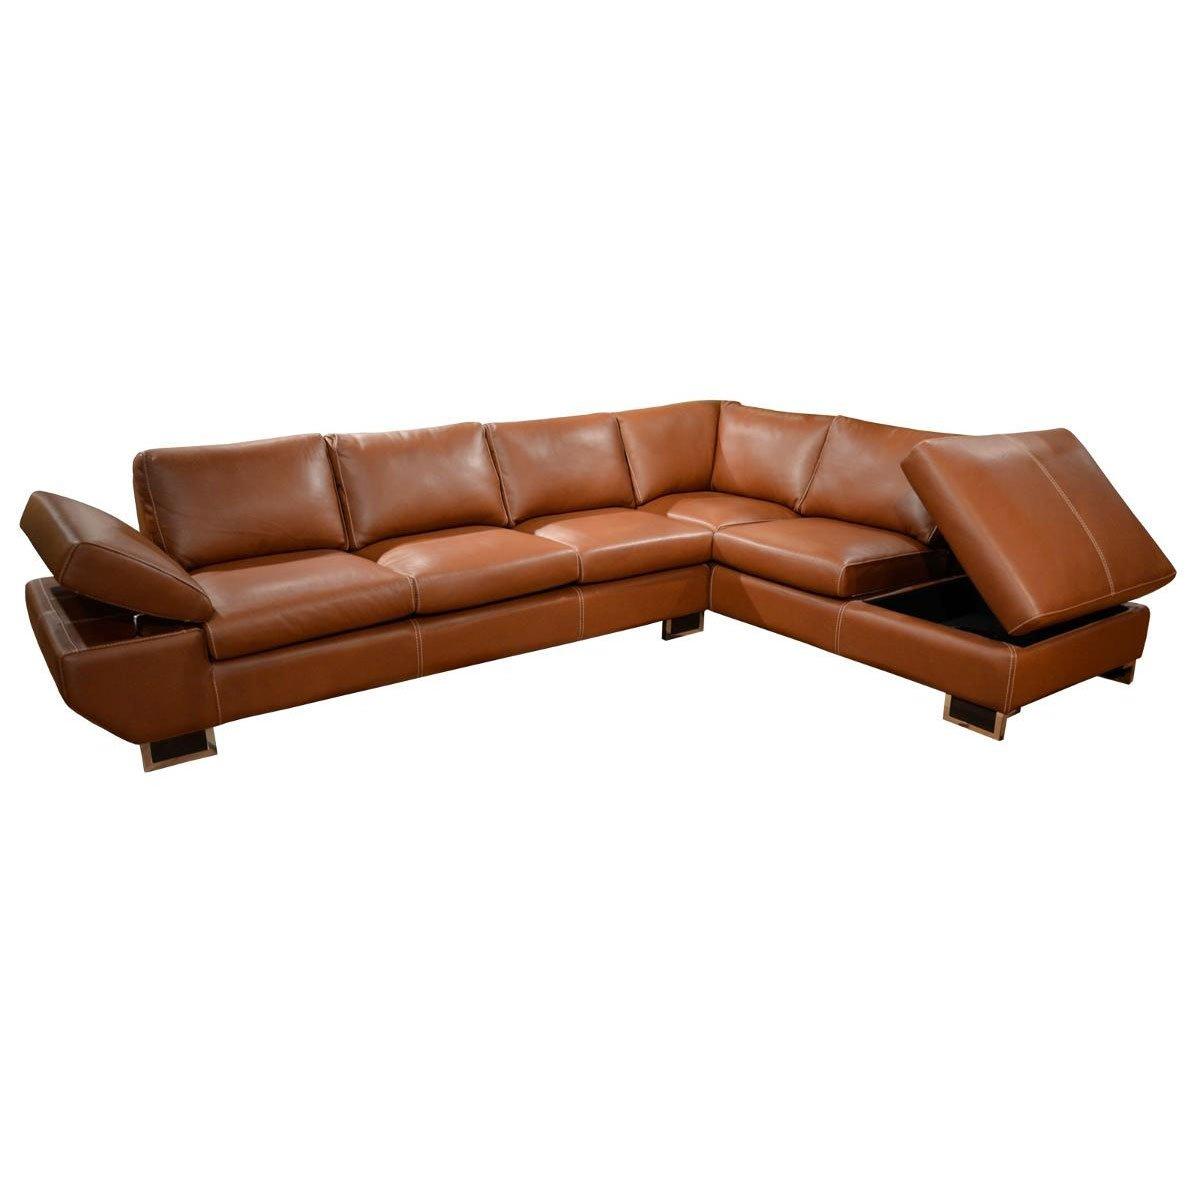 Leather Sofa Sarasota, FL